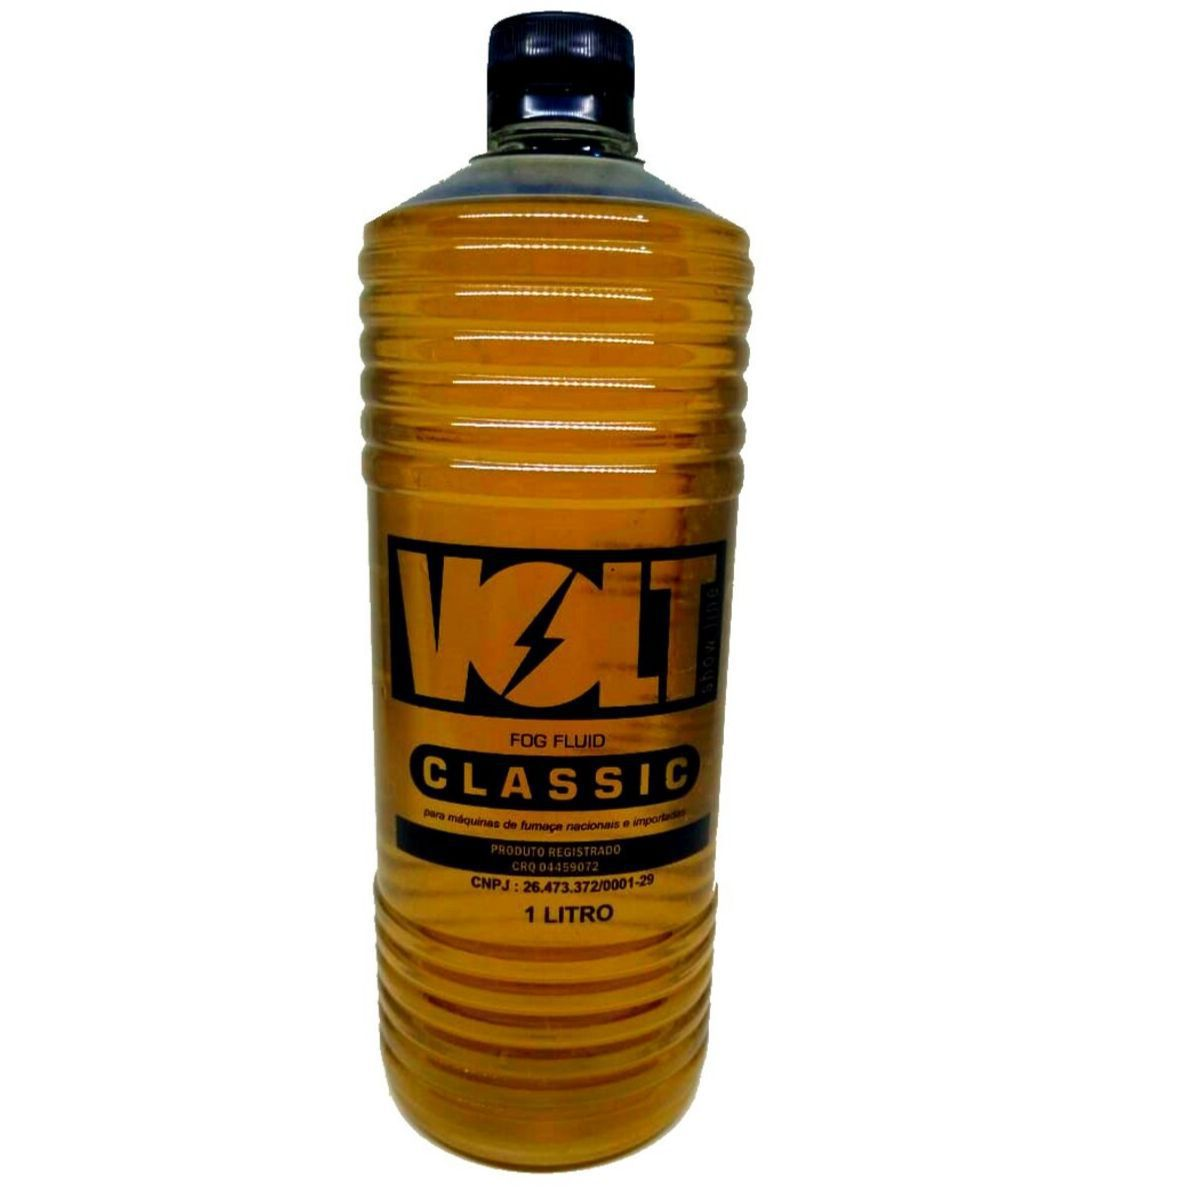 Kit 10x Líquido Fluído 1 Litro Para Maquina Fumaça Classic Volt  - MY1012